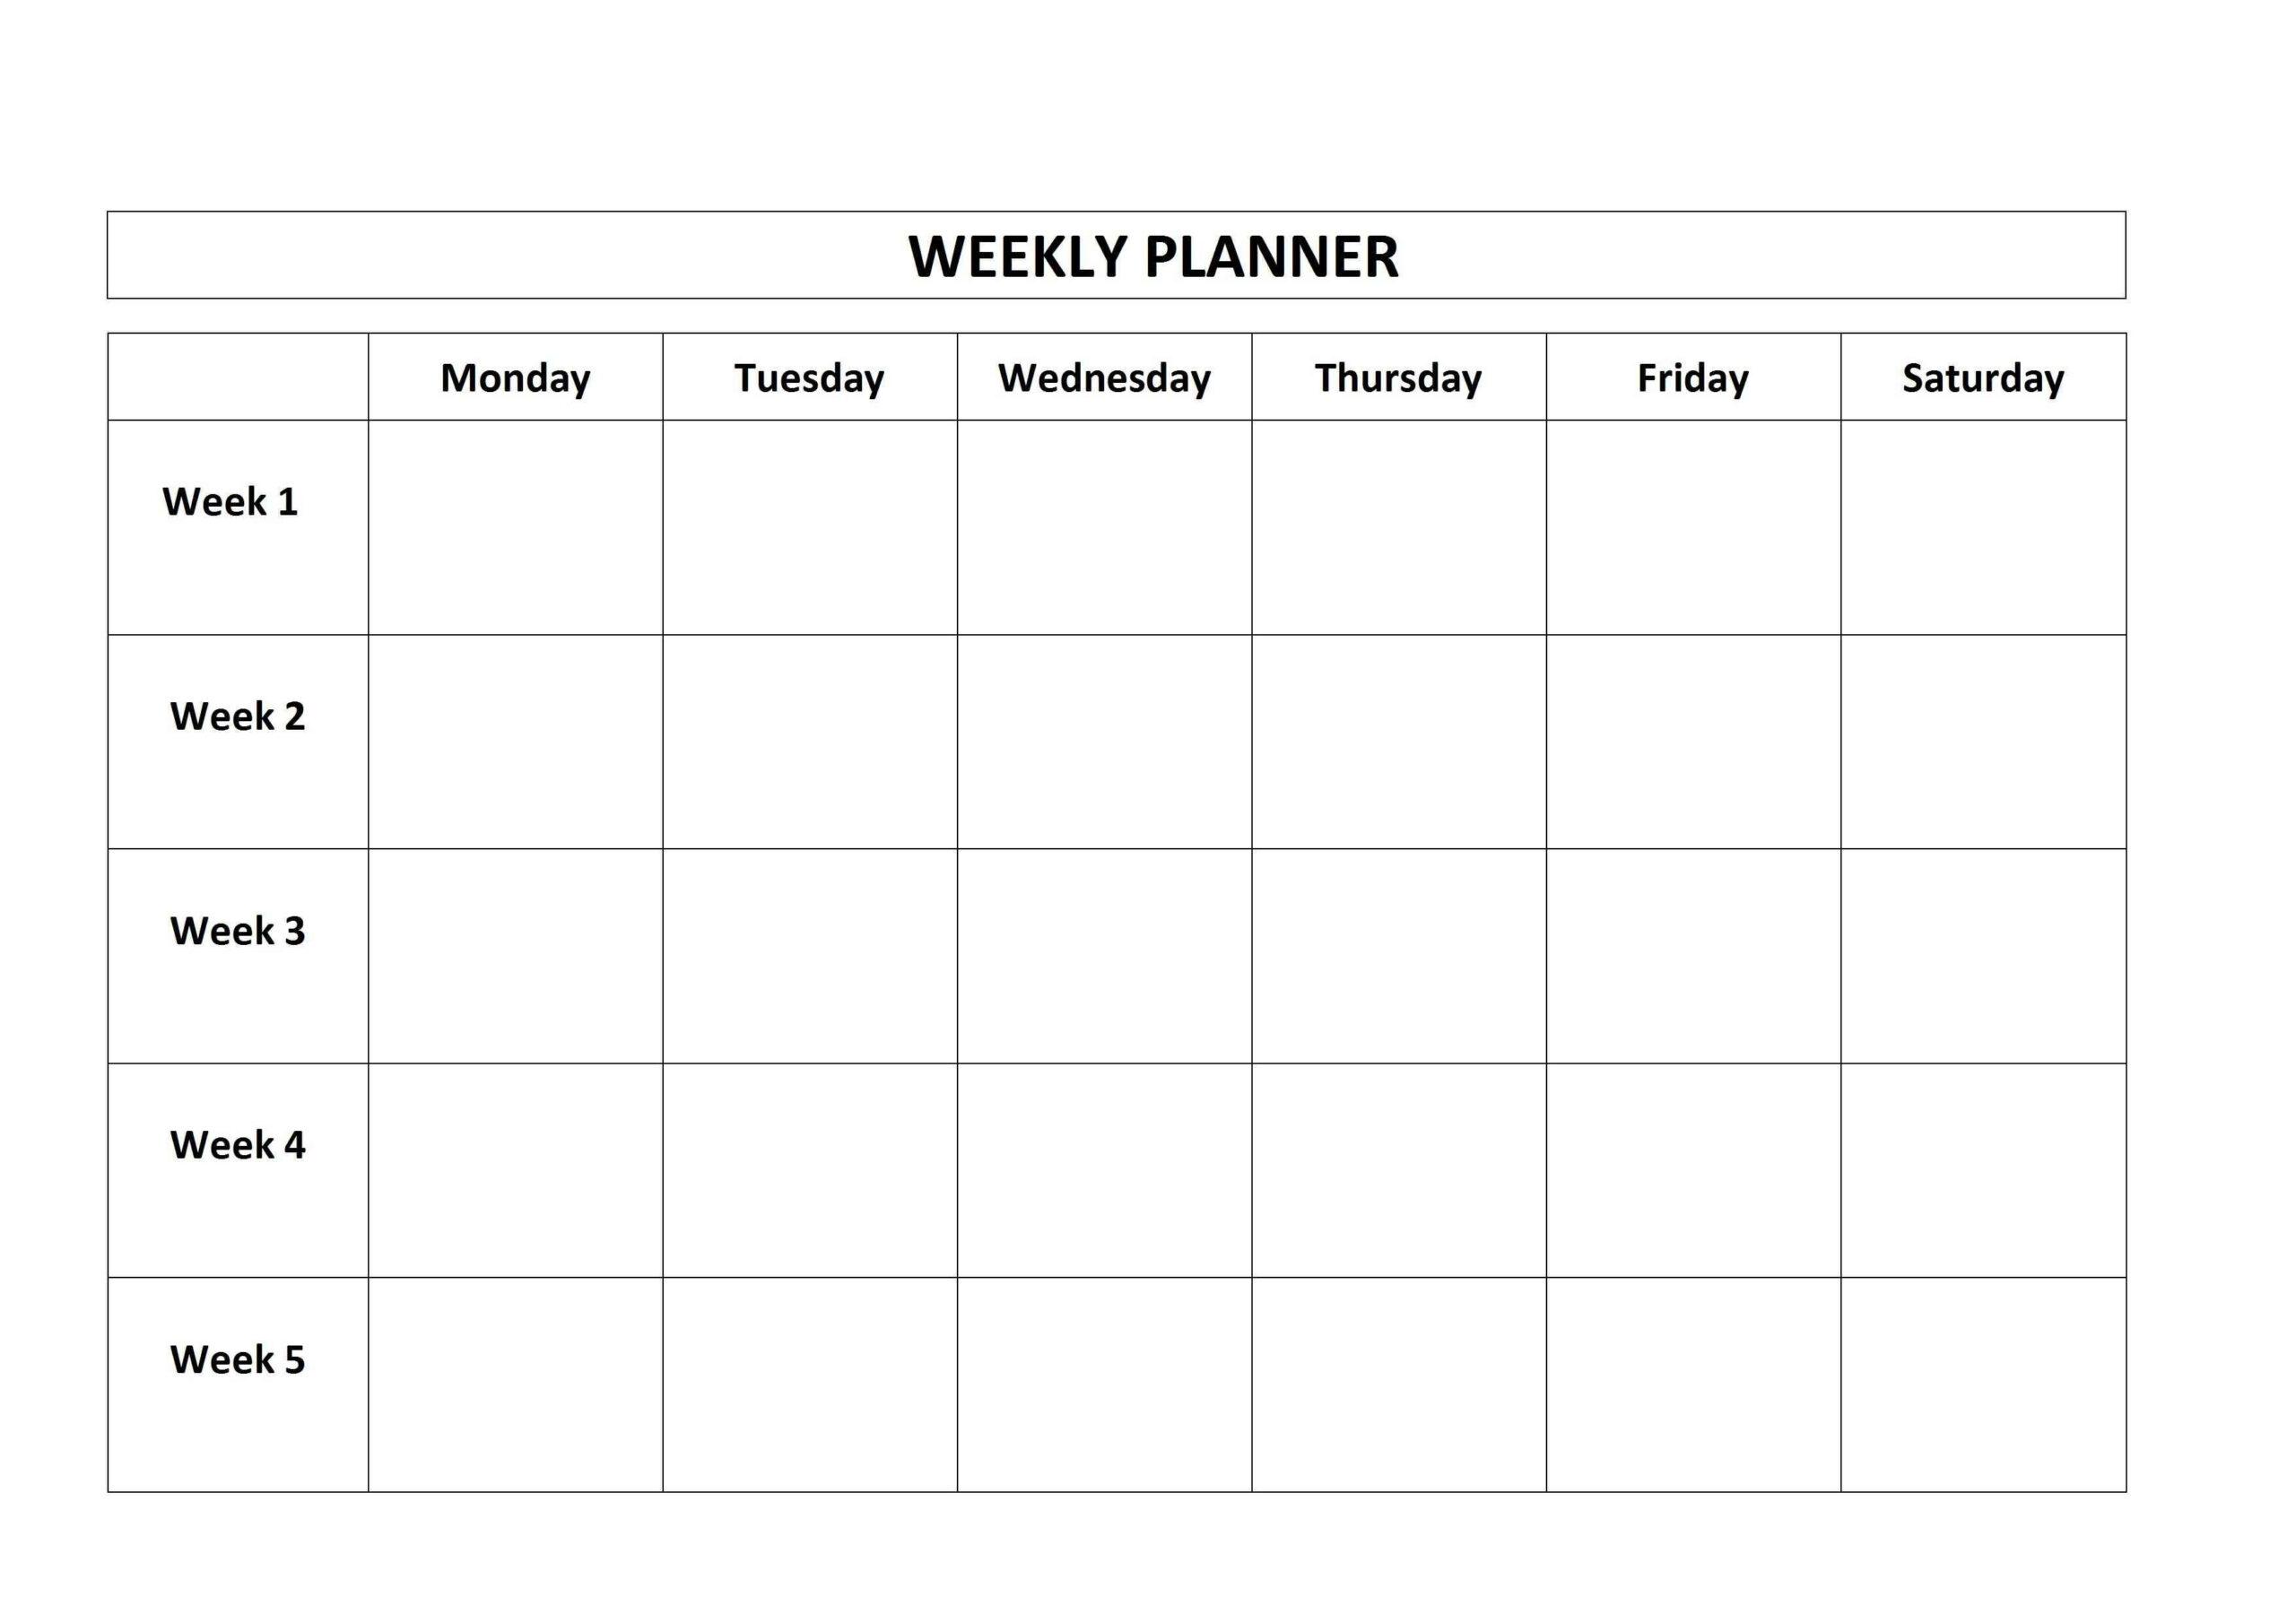 5 Day Calendar Template  Vaydile.euforic.coblank Calendar Template 5 Day   Weekly Calendar within 5 Day Calendar Template